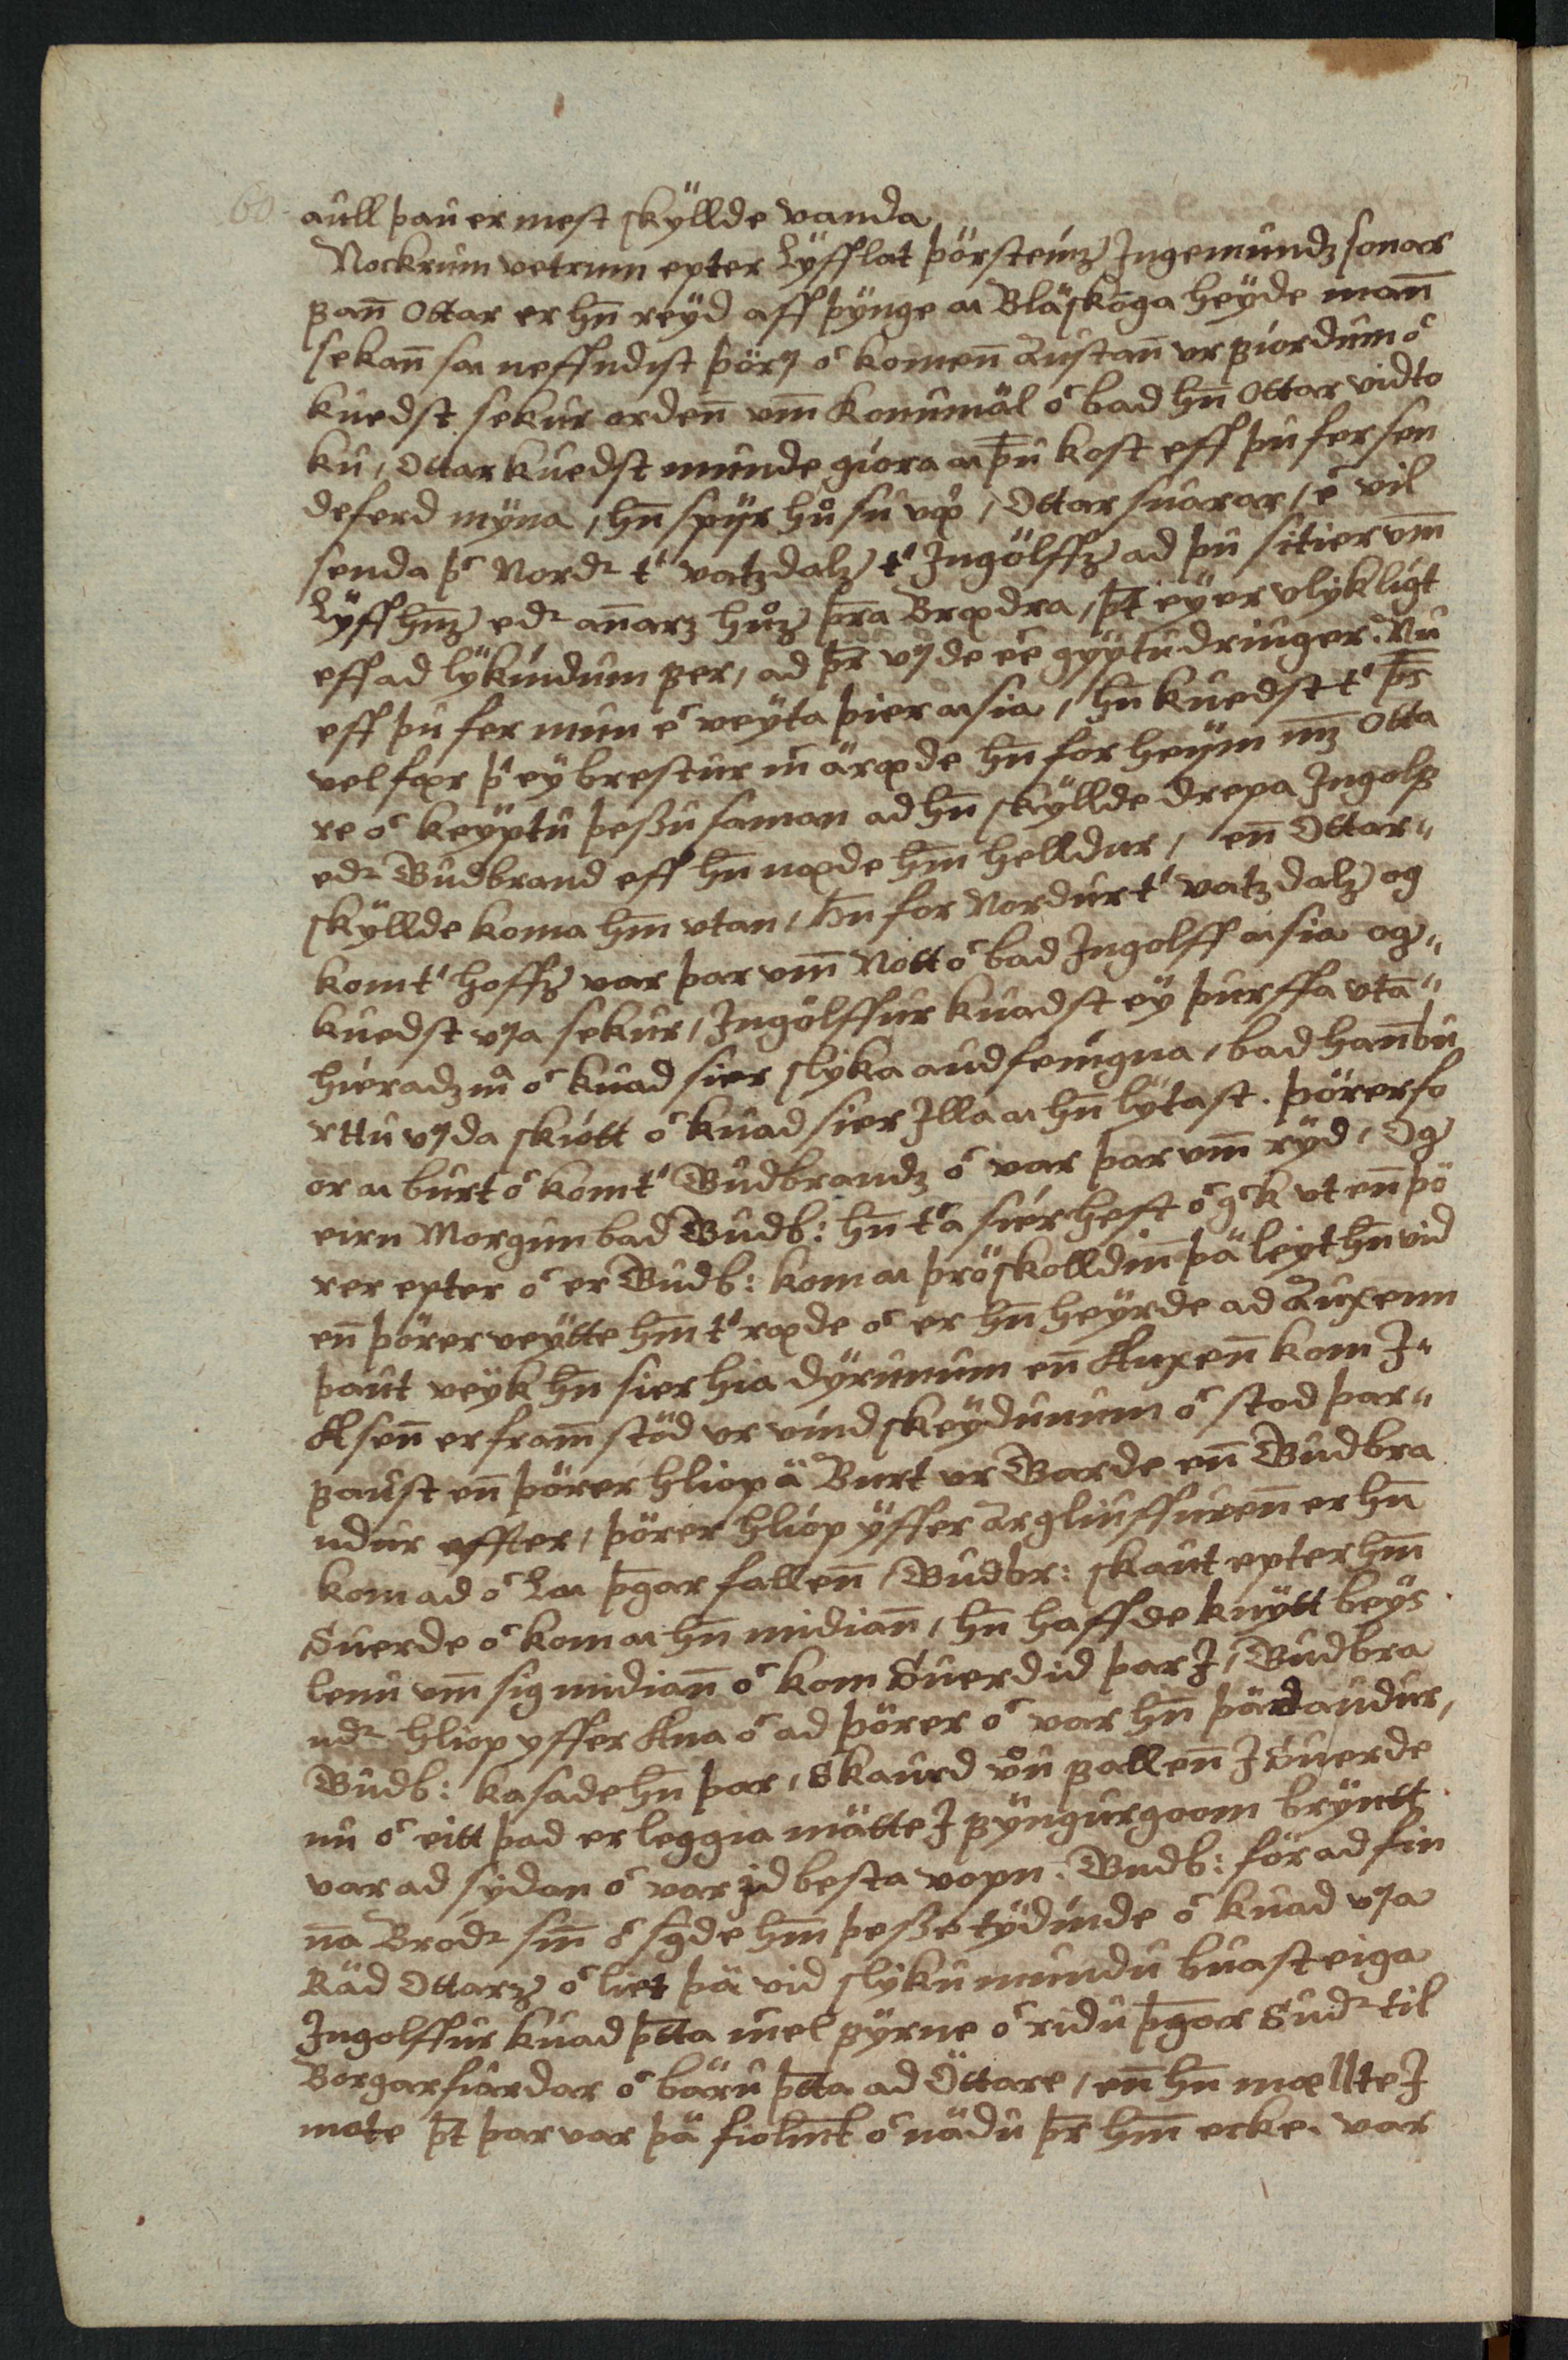 AM 138 fol - 30v